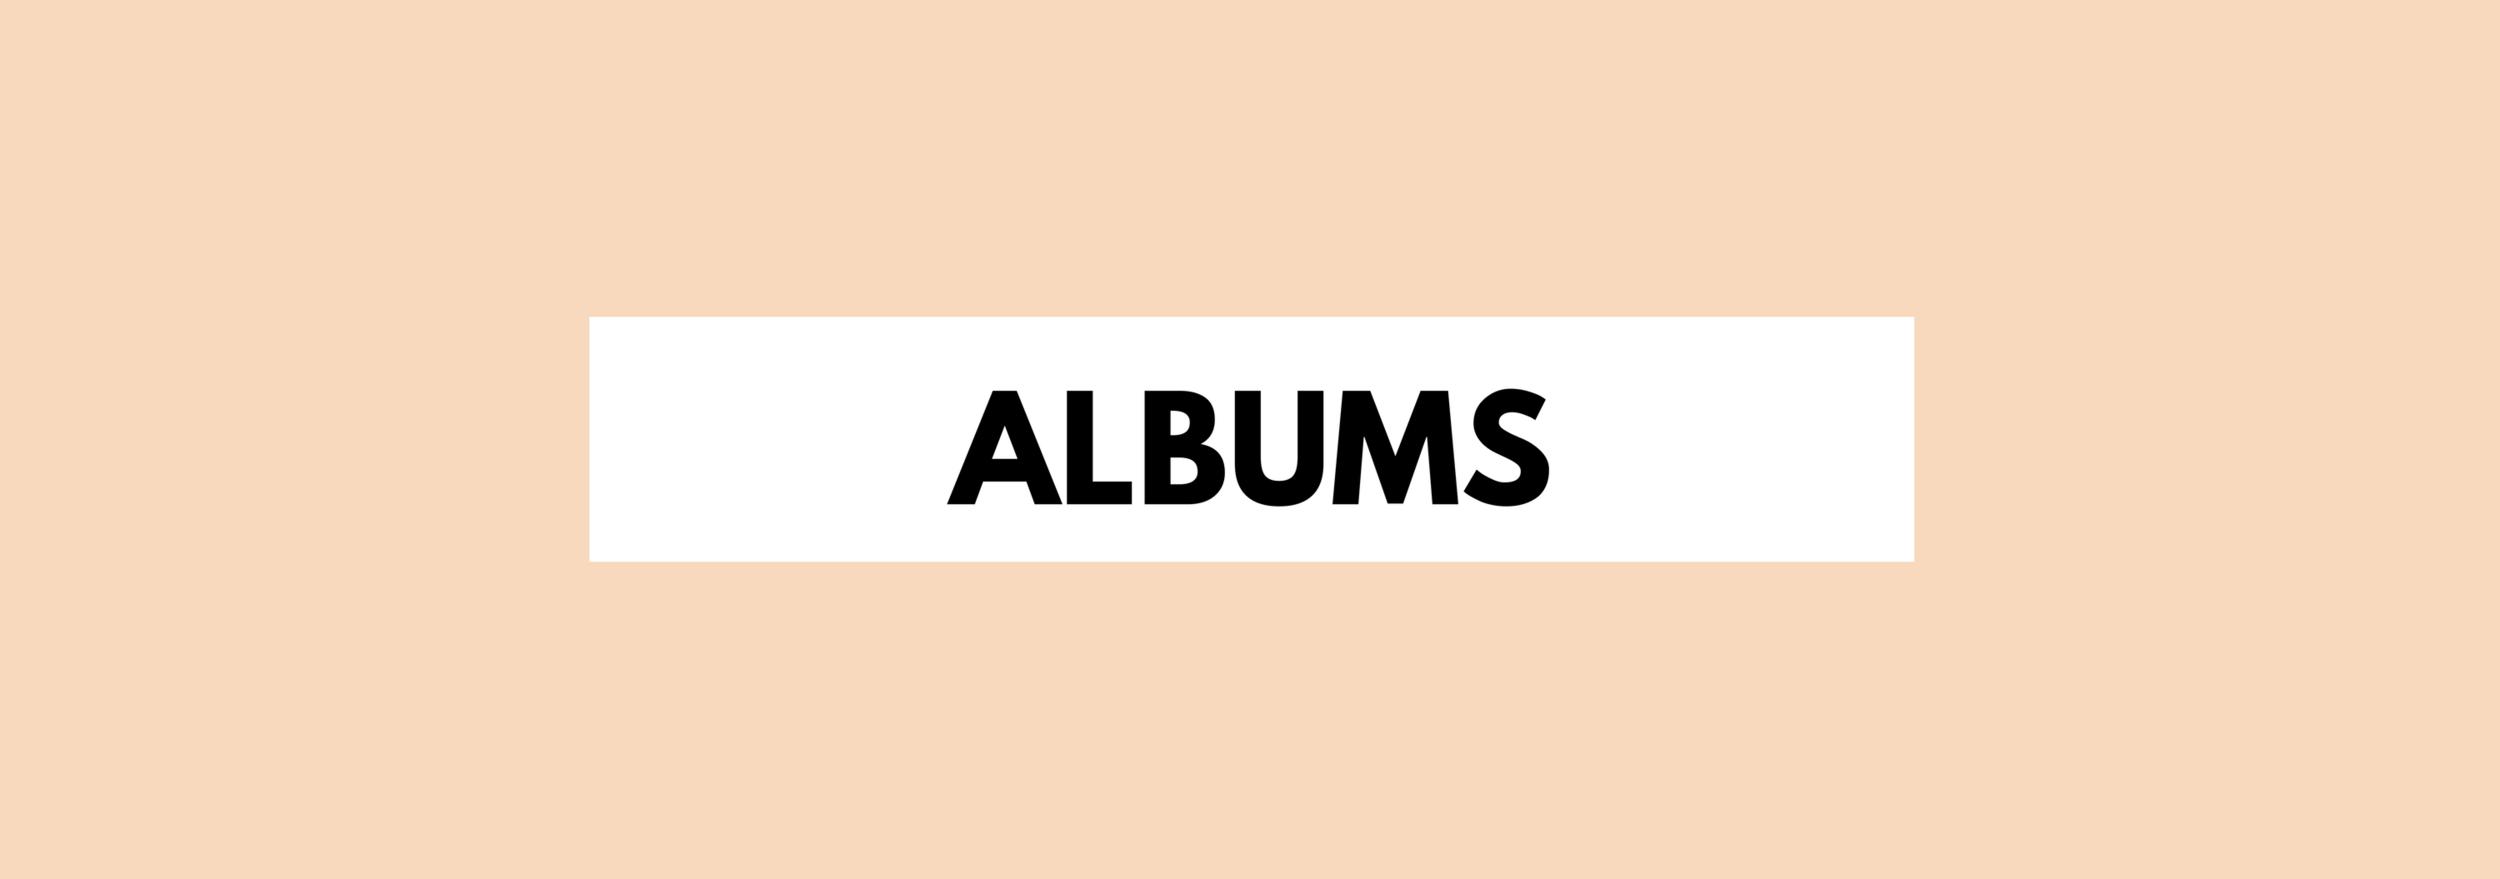 ALBUMS.png